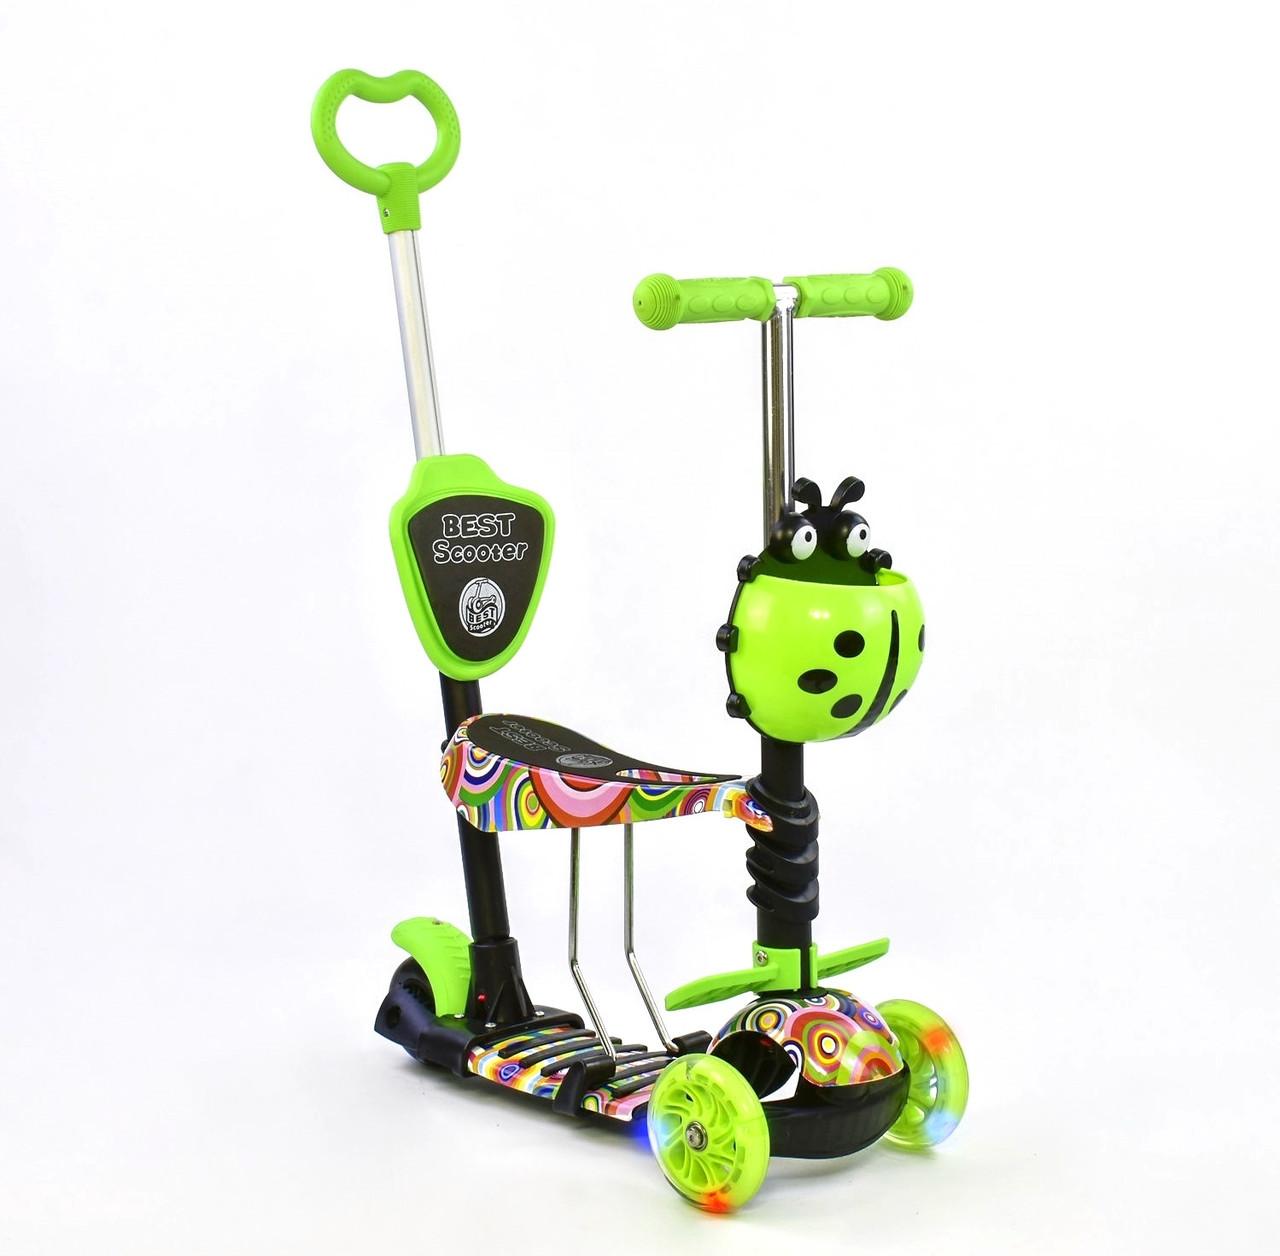 Детский самокат 5в1 Best Scooter 33650